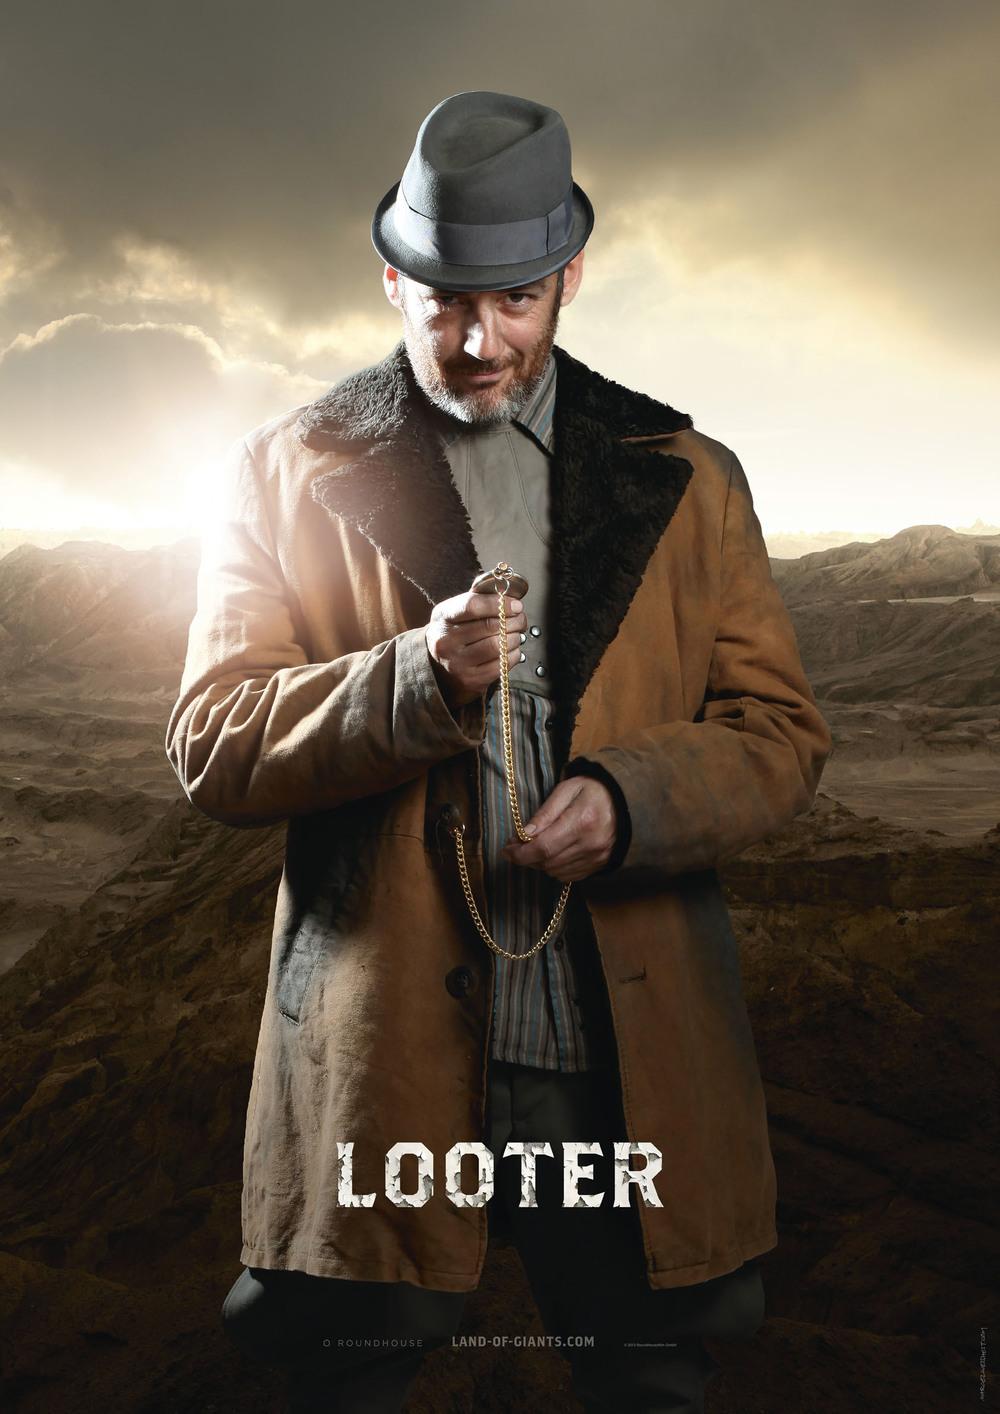 landofgiants_characterposter03_looter_594x840mm.jpg